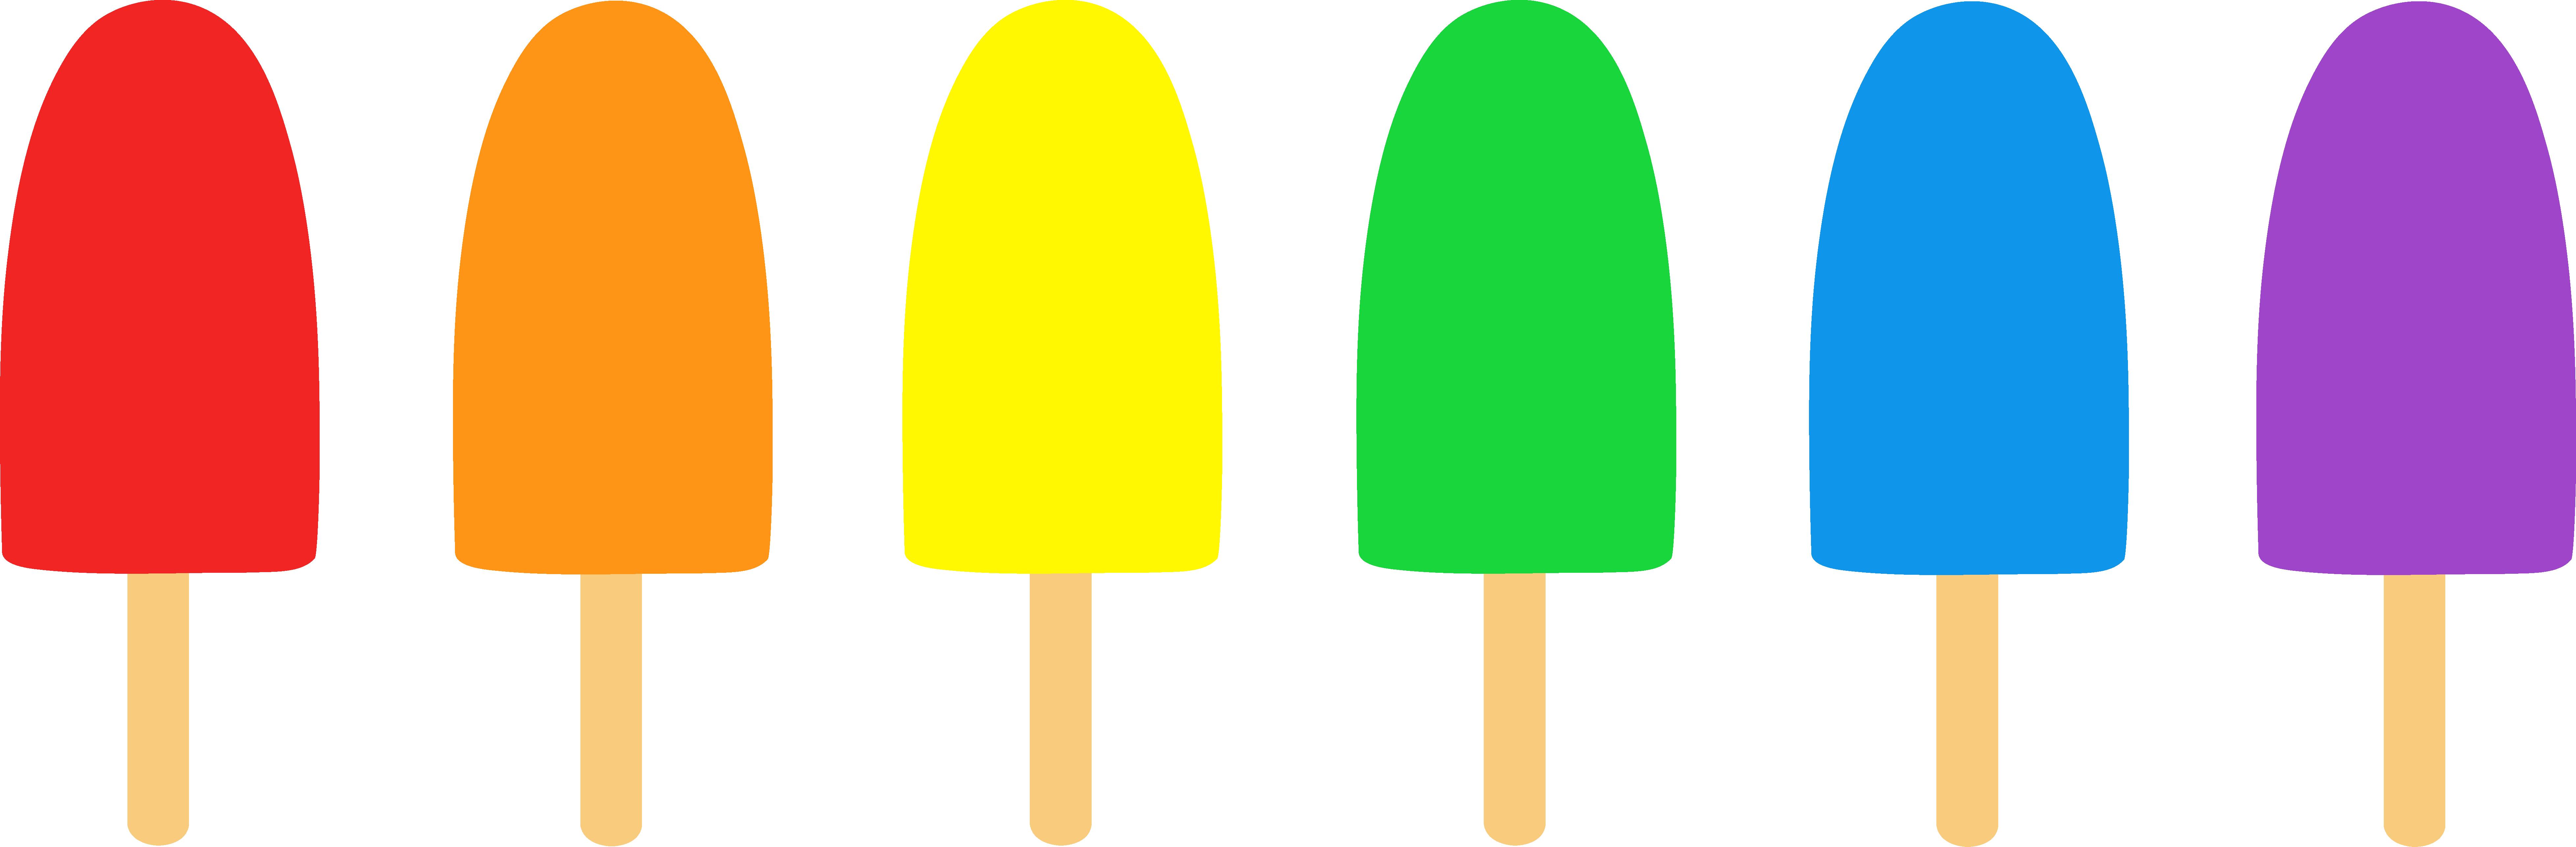 7825x2573 Simple Ice Pops Design